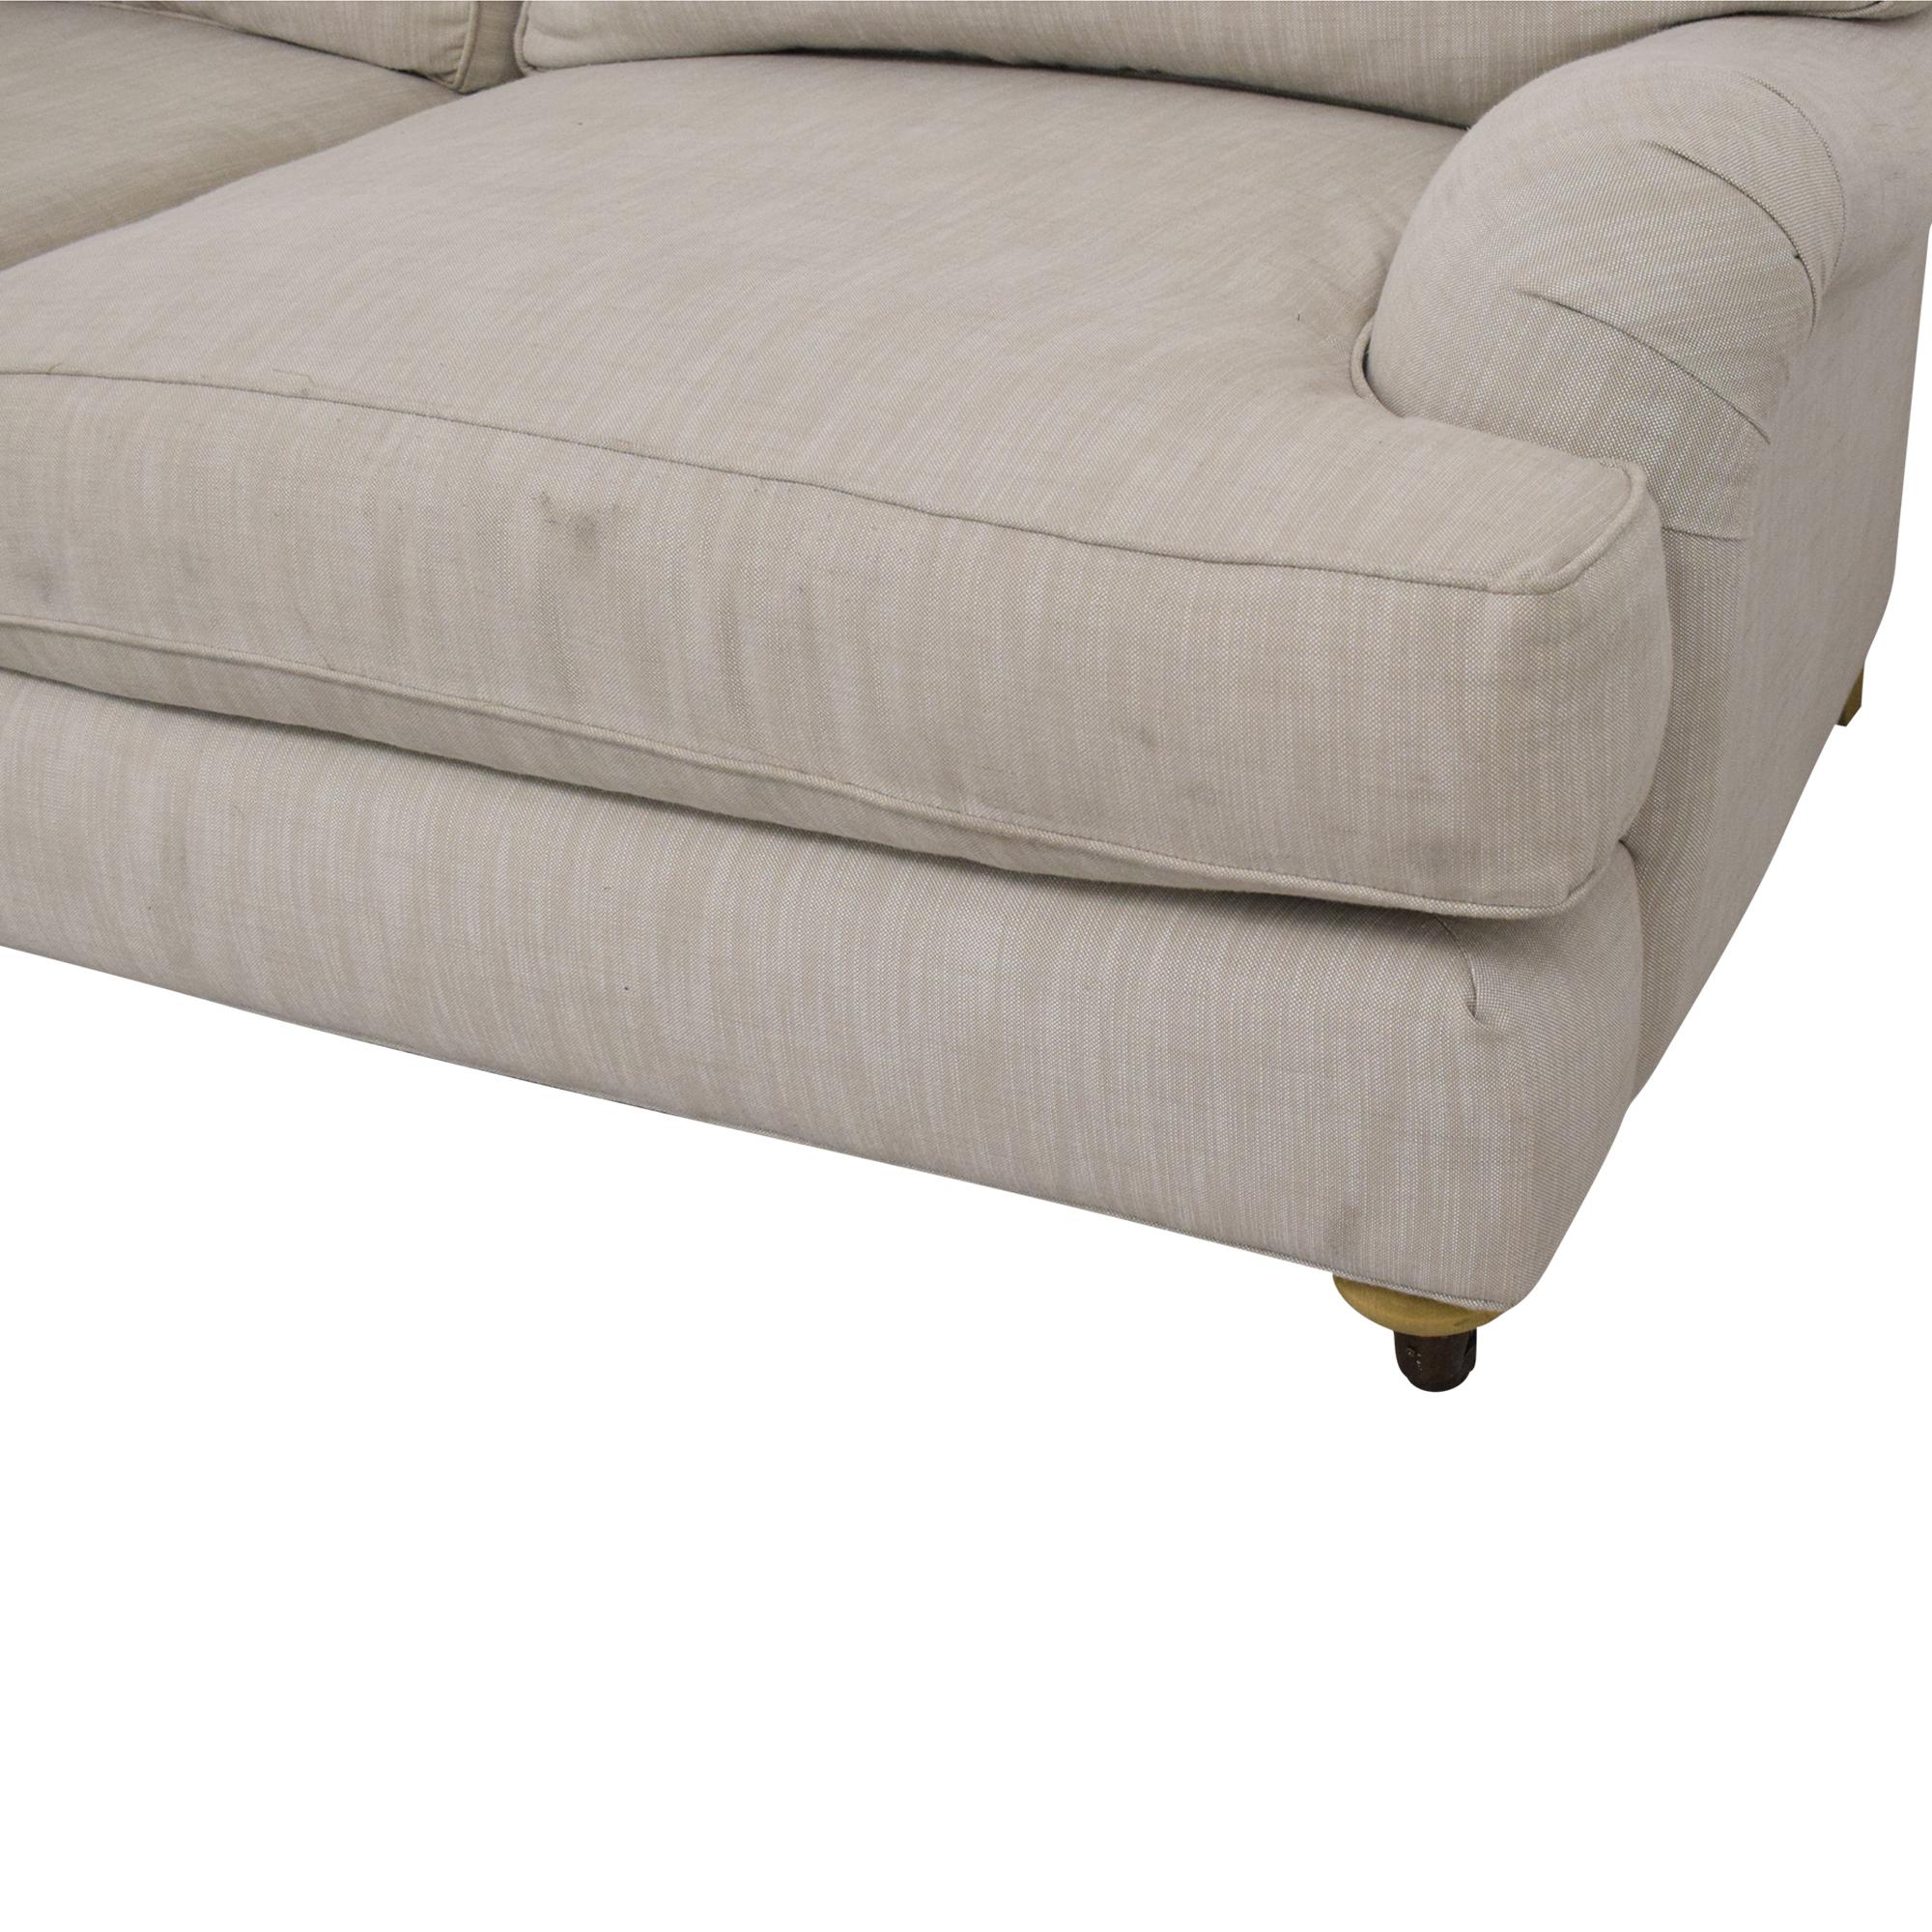 Restoration Hardware English Roll Arm Sofa / Sofas